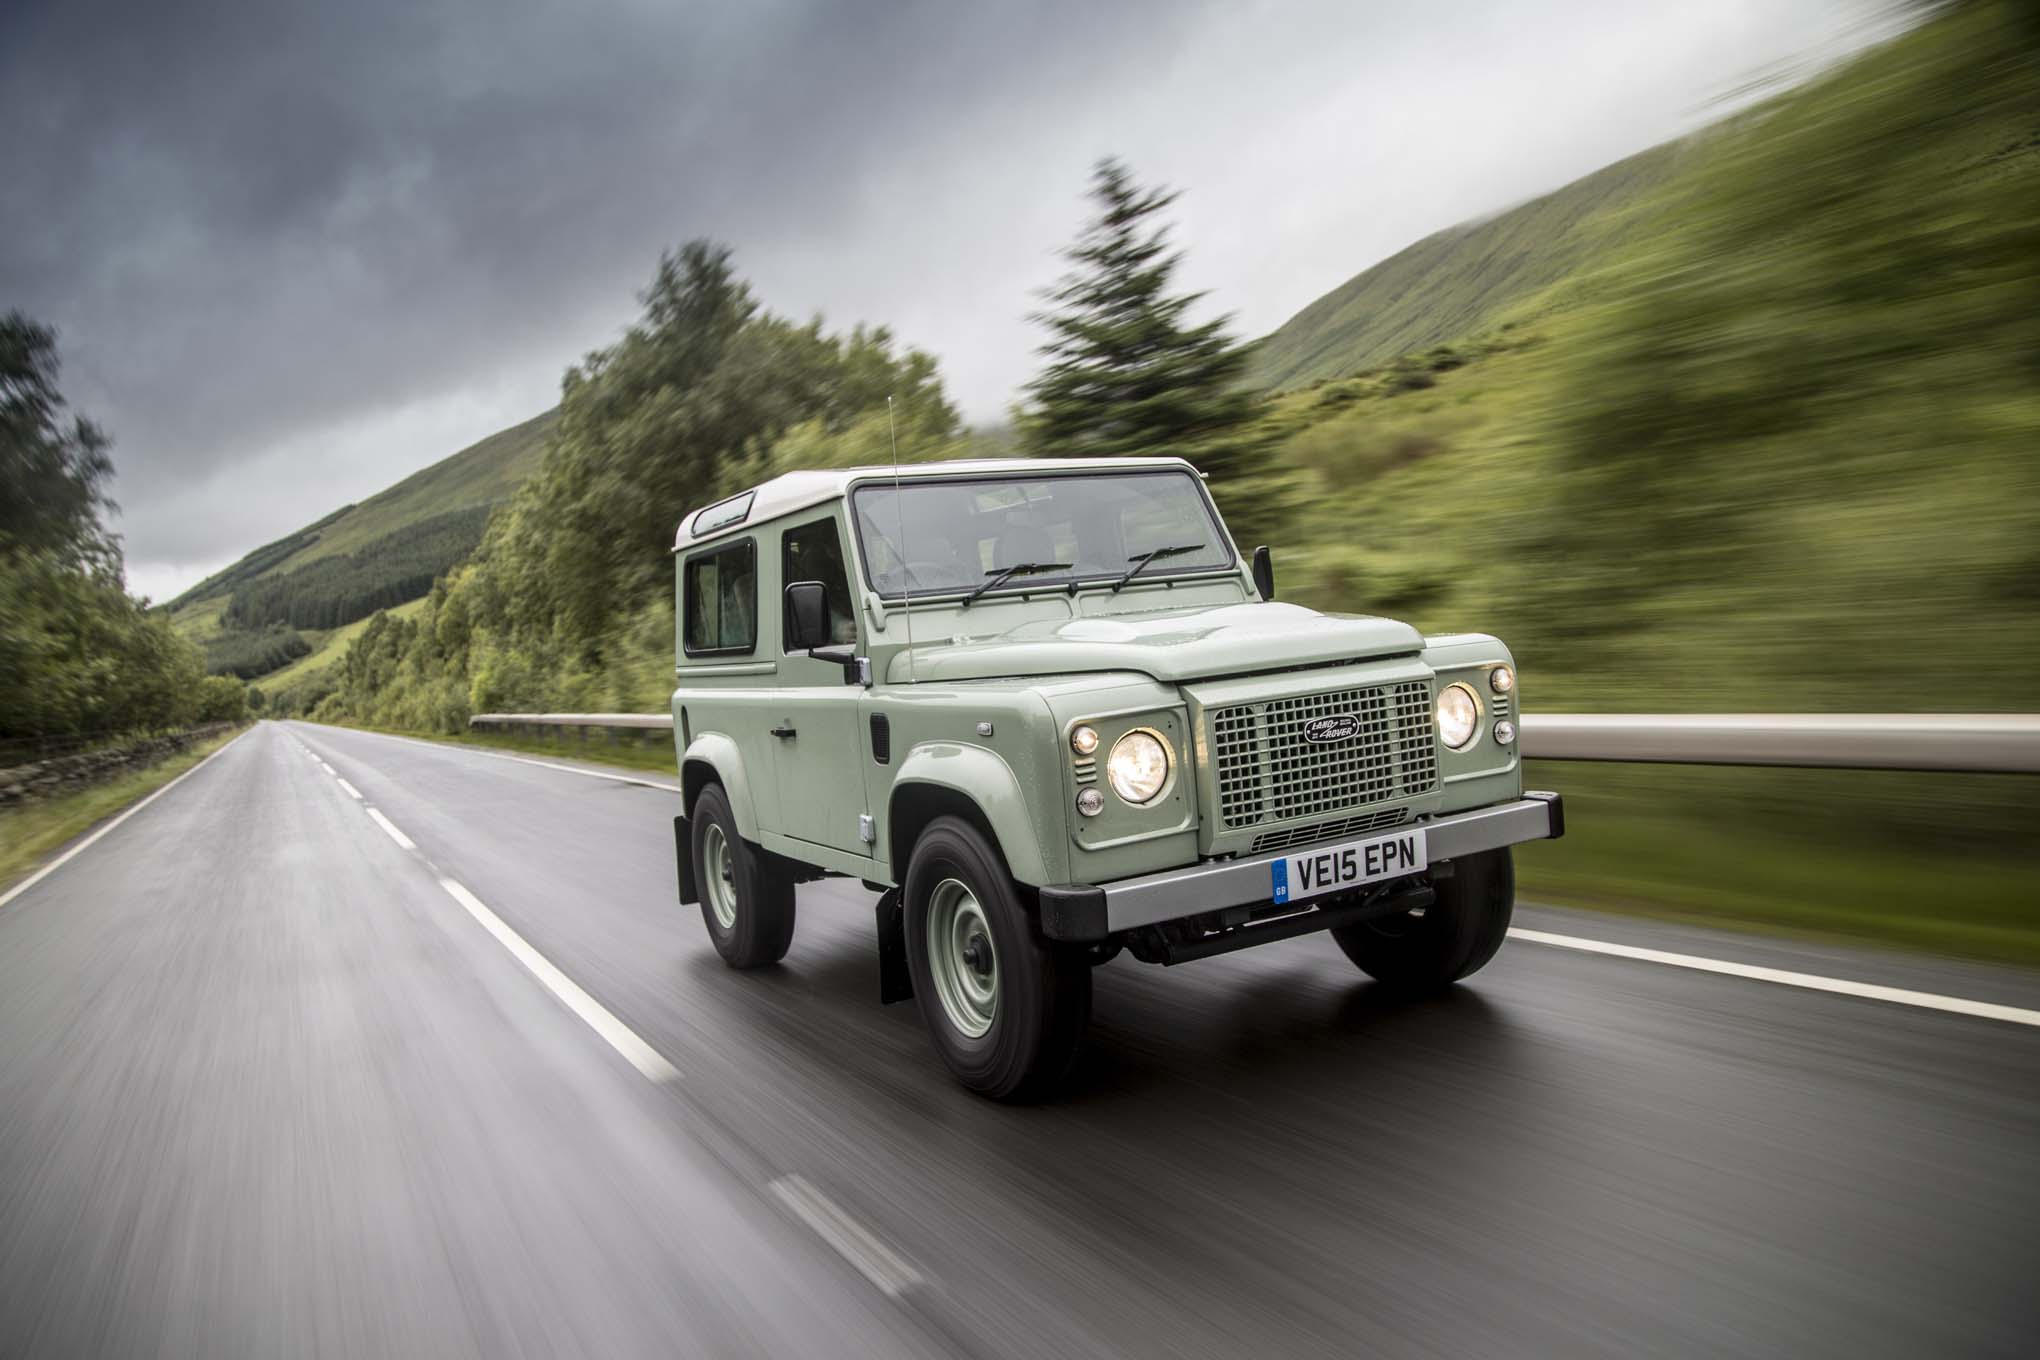 Polarizing Land Rover Defender Design Planned